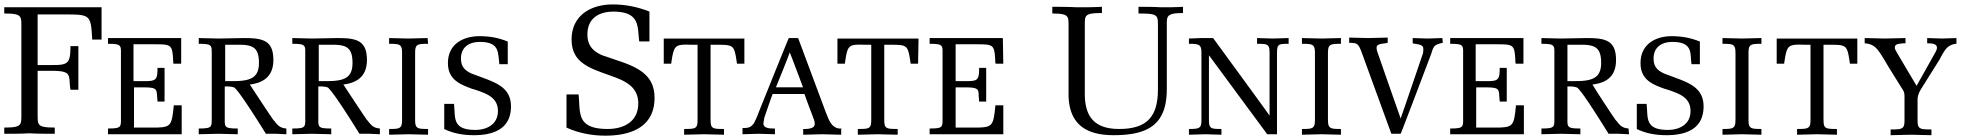 Mobile Ferris State University Logo